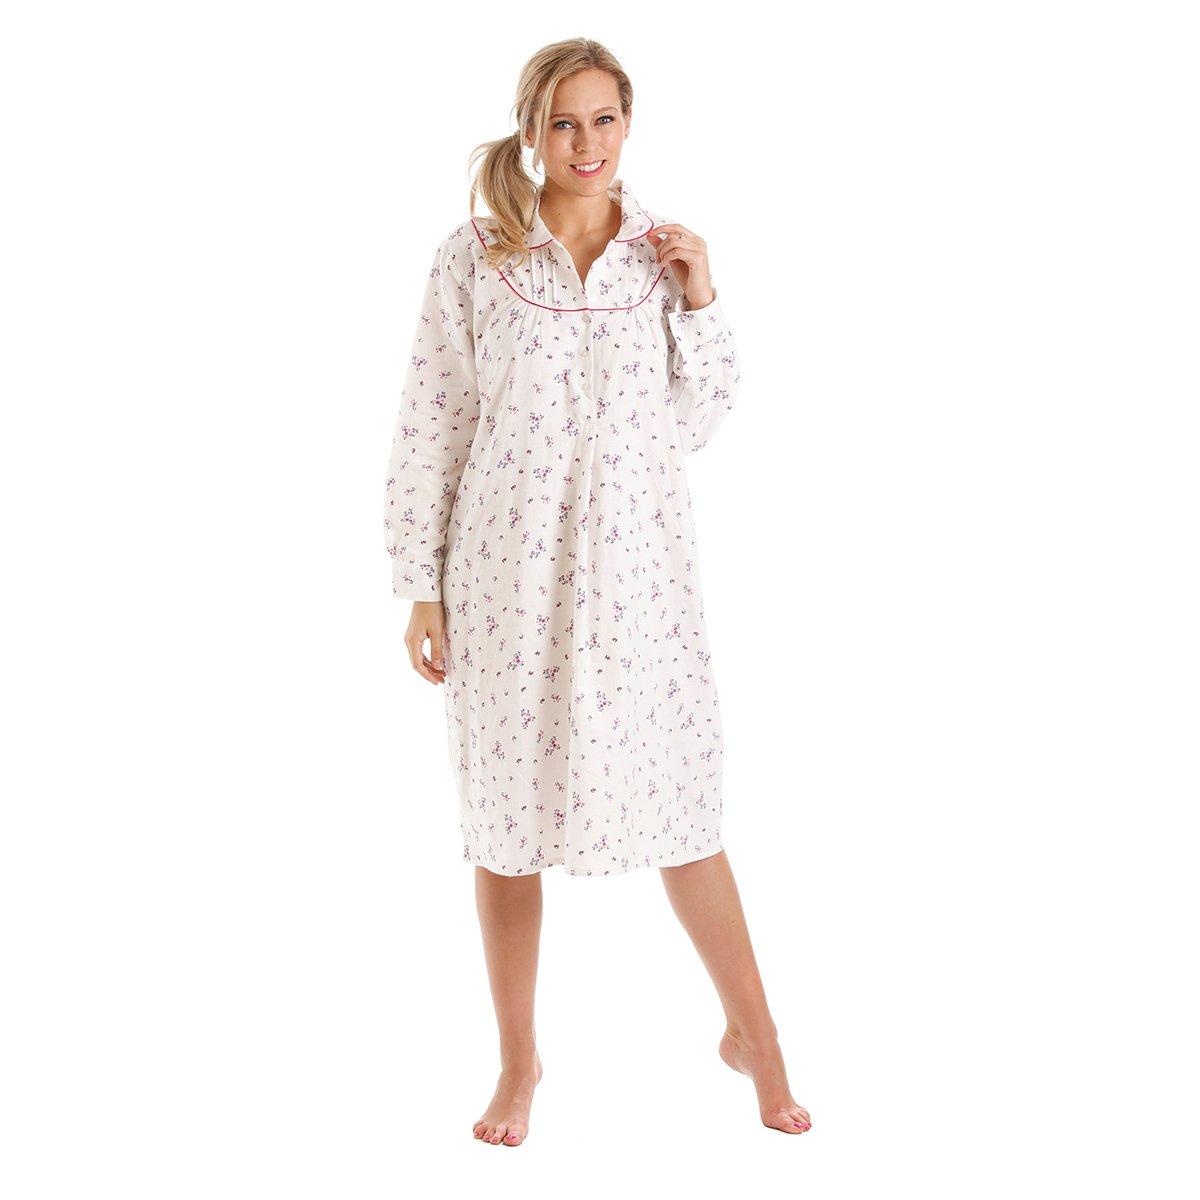 cecdd3a963 Ladies Womens Wincyette Brushed Cotton Nightie Nightdress Size 10 - 24